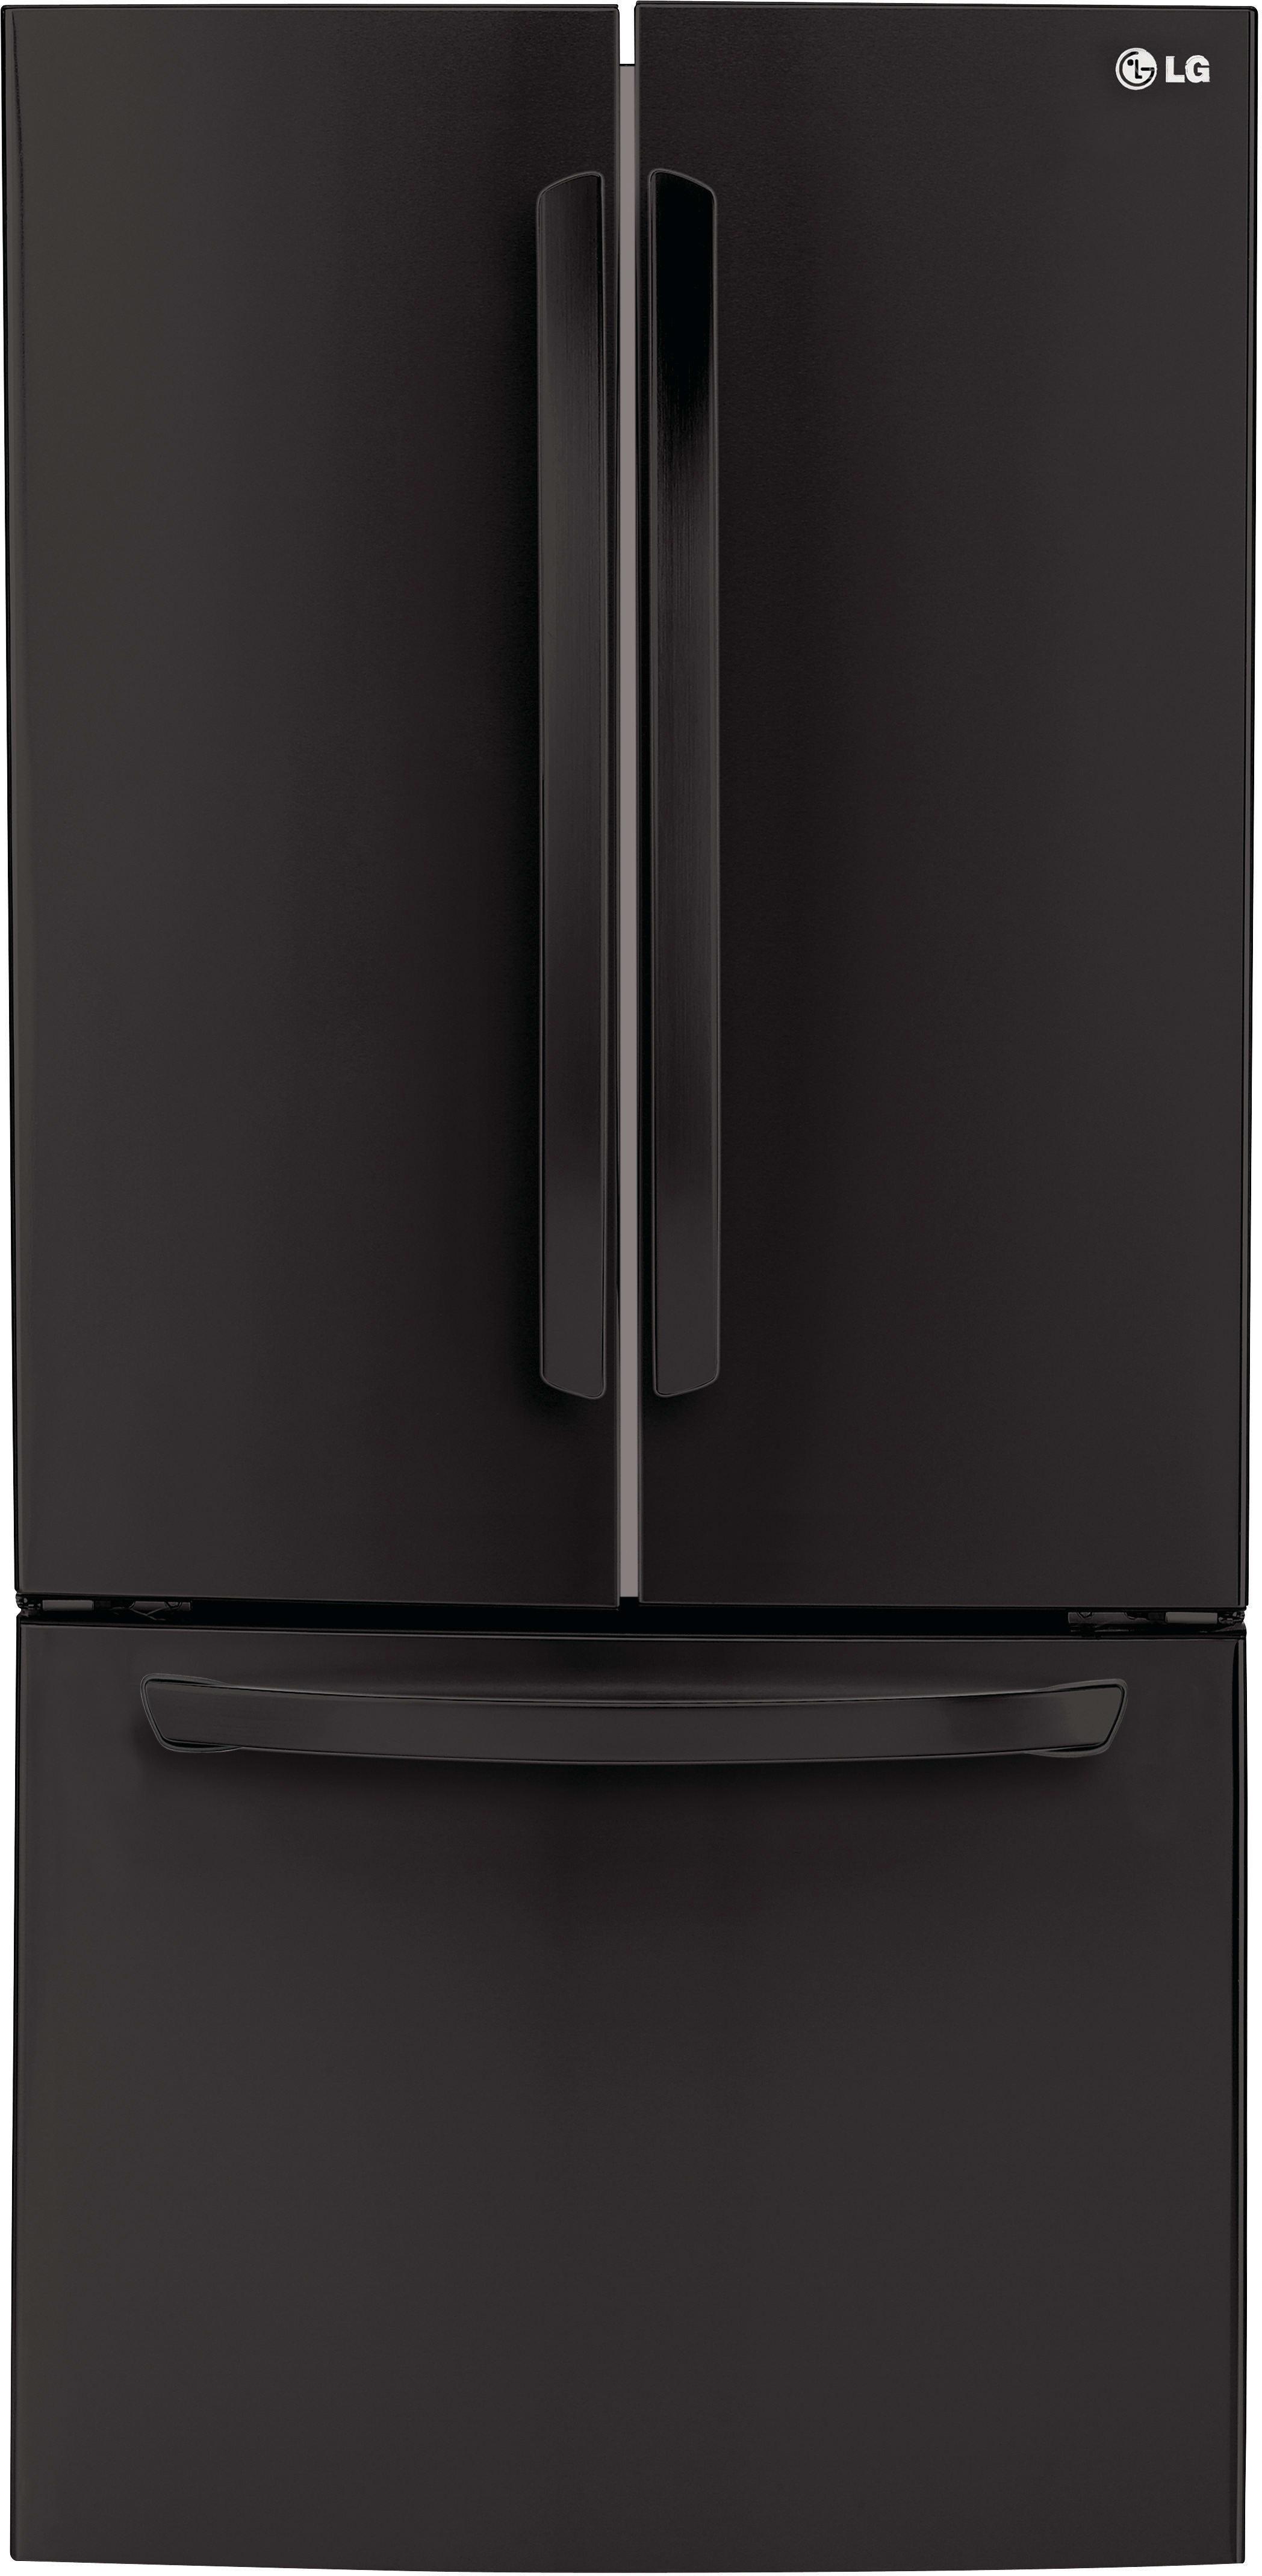 Lg Lfc24770sb 33 Inch French Door Refrigerator With Linear